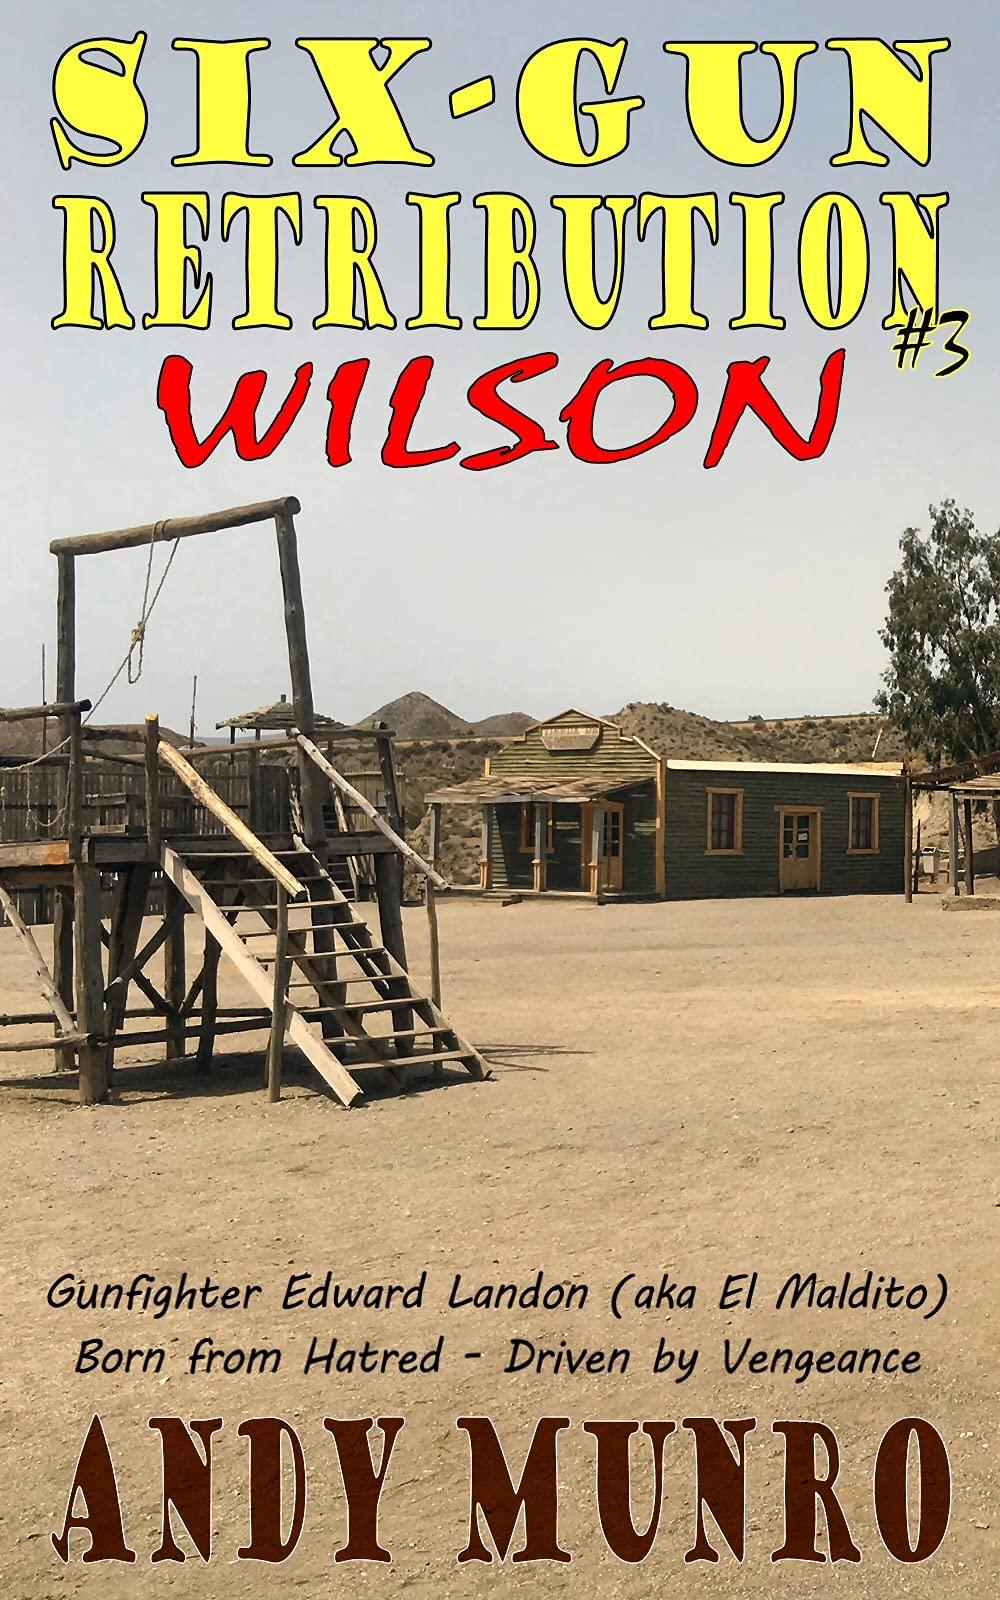 Six-Gun Retribution: WILSON (Classic Western Action Adventure Saga - Gunfighter Edward Landon (aka El Maldito) - Kindle Short Story Fiction Book 3)